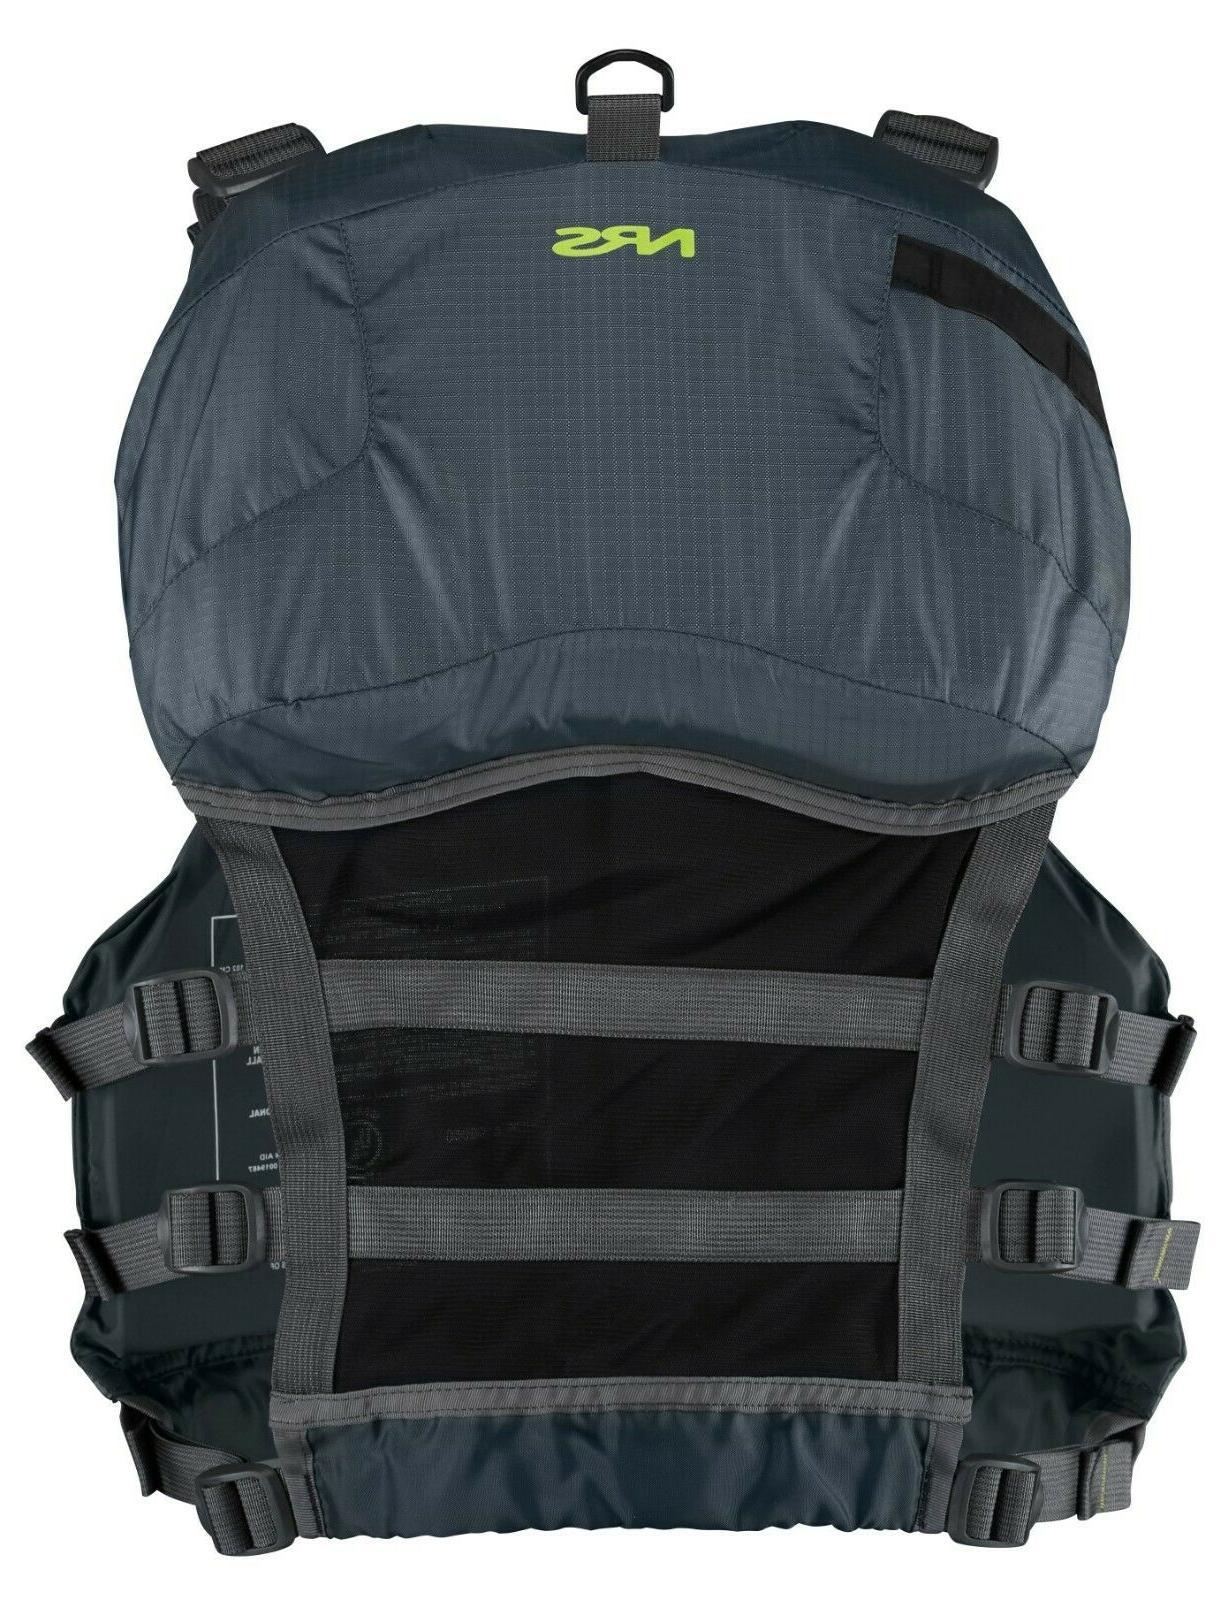 NRS Lifejacket S/M